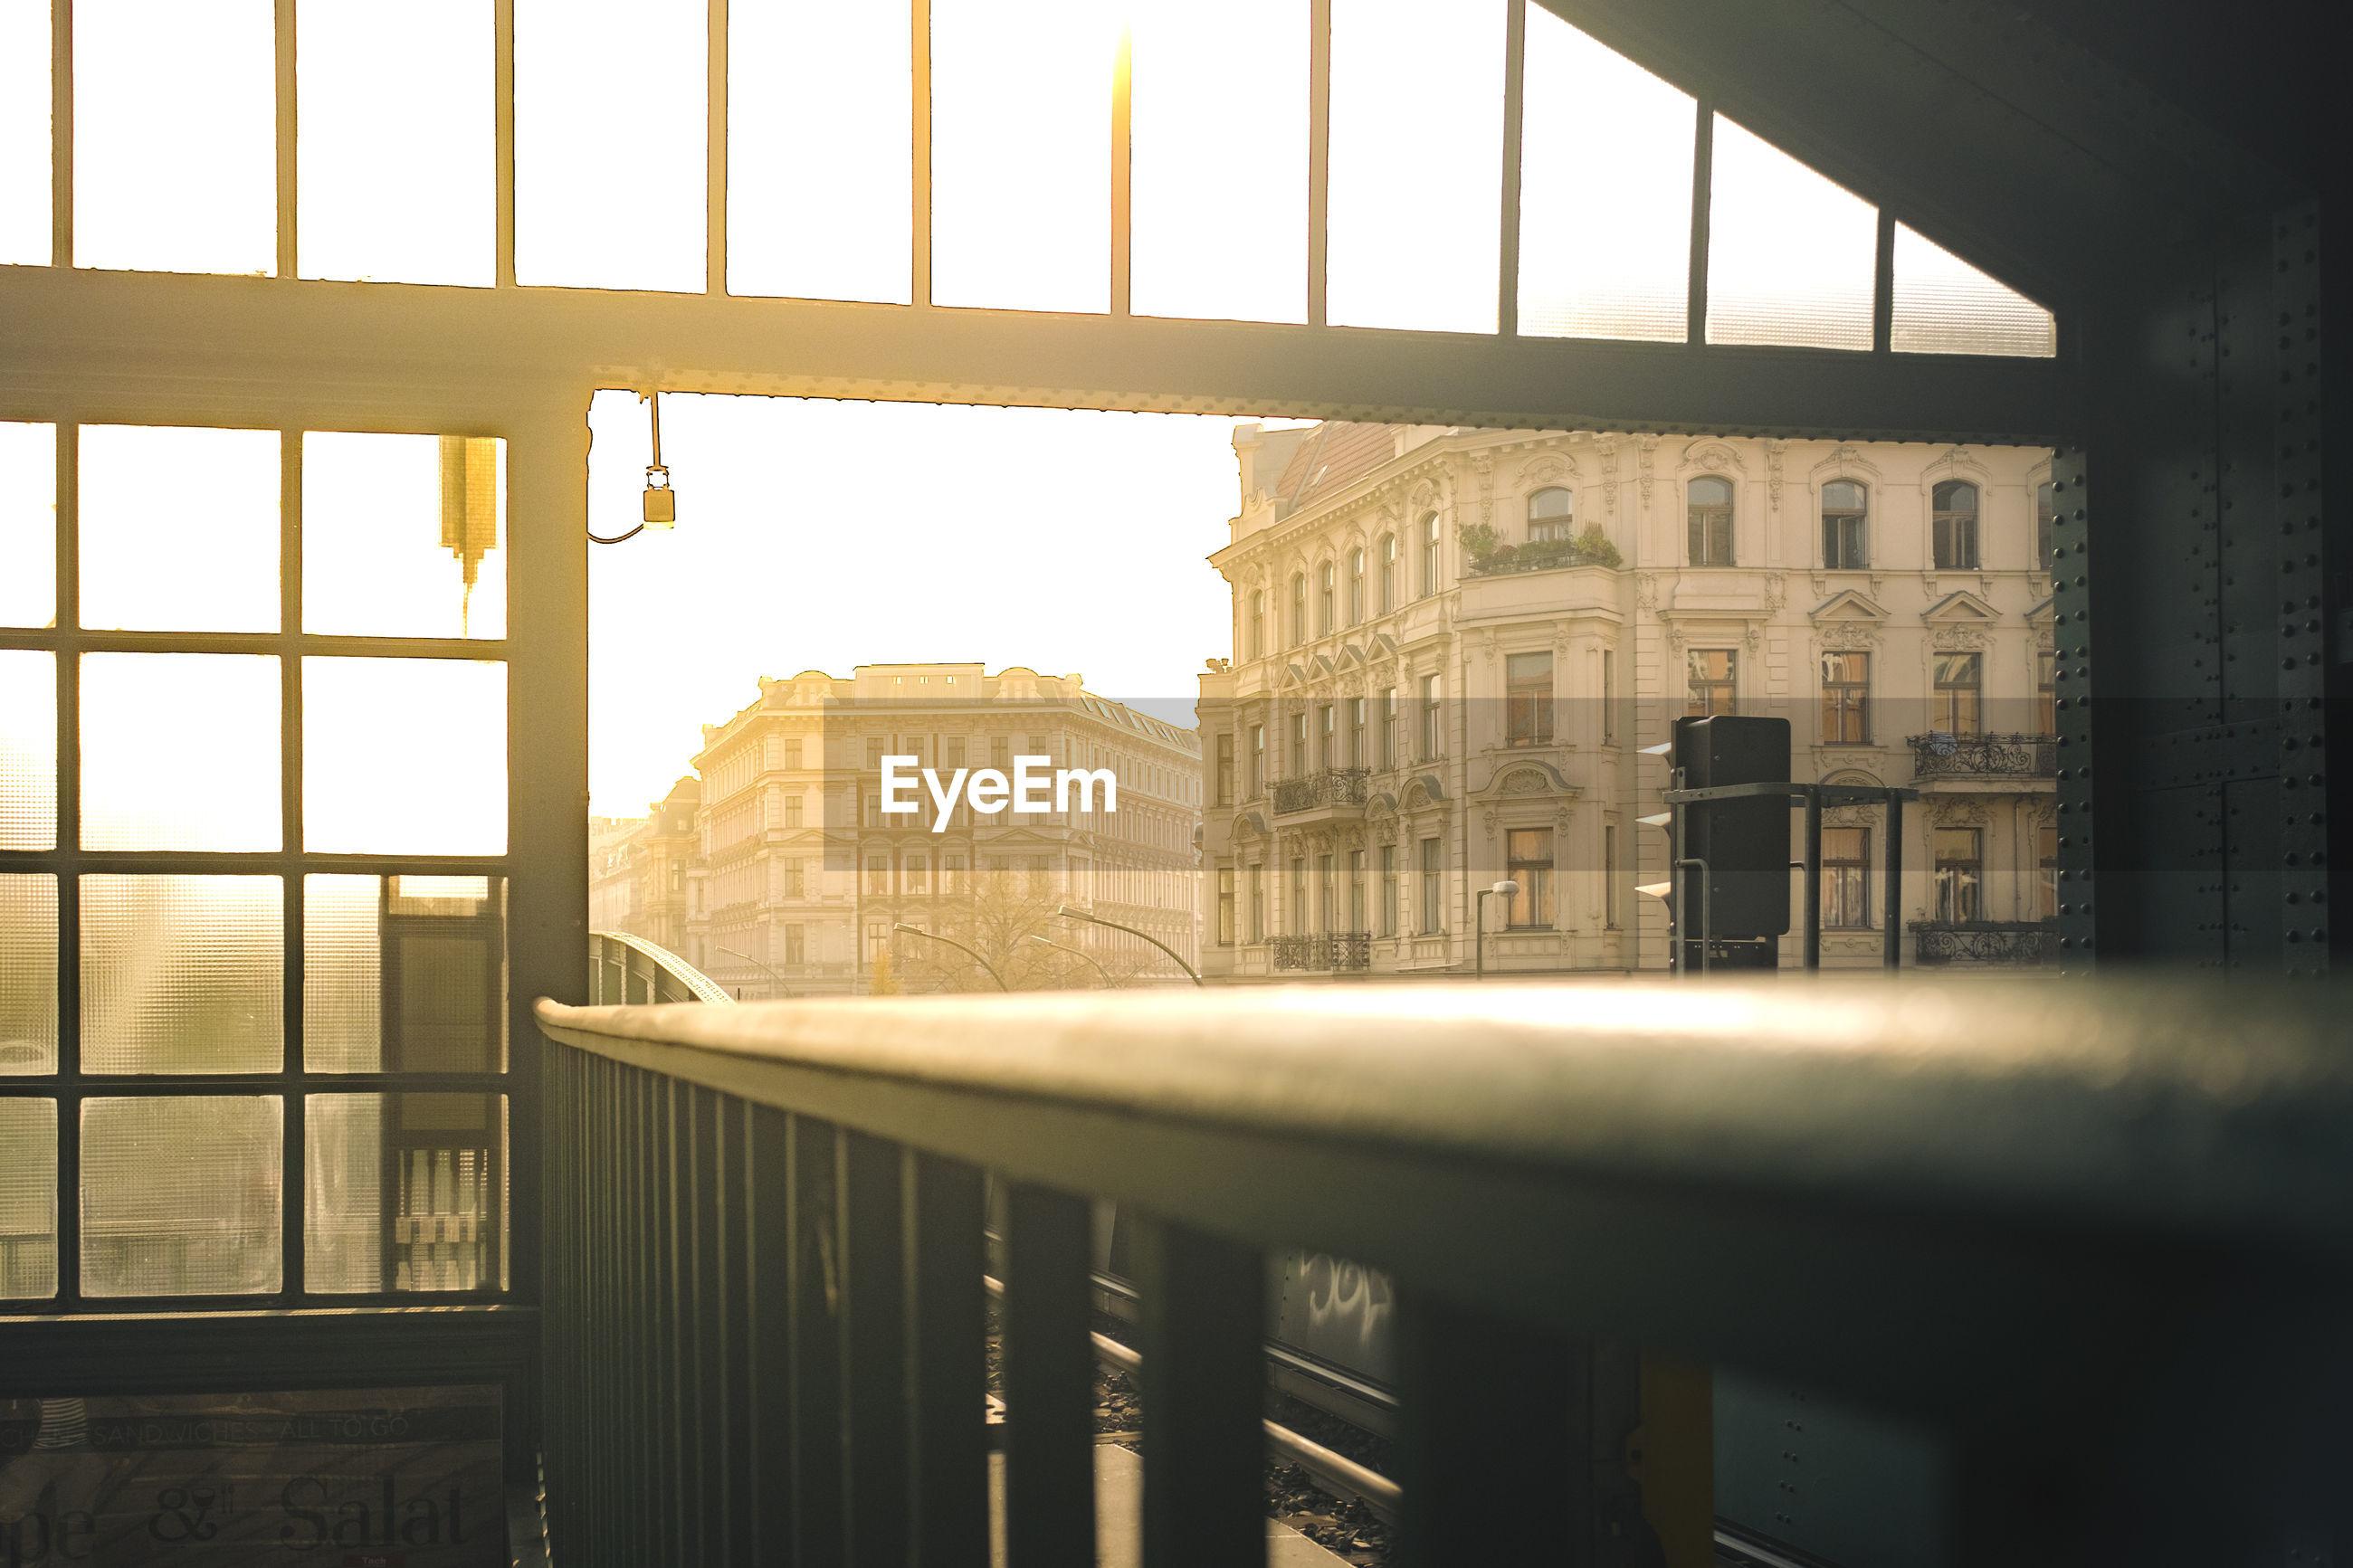 Buildings in city seen from eberswalder station